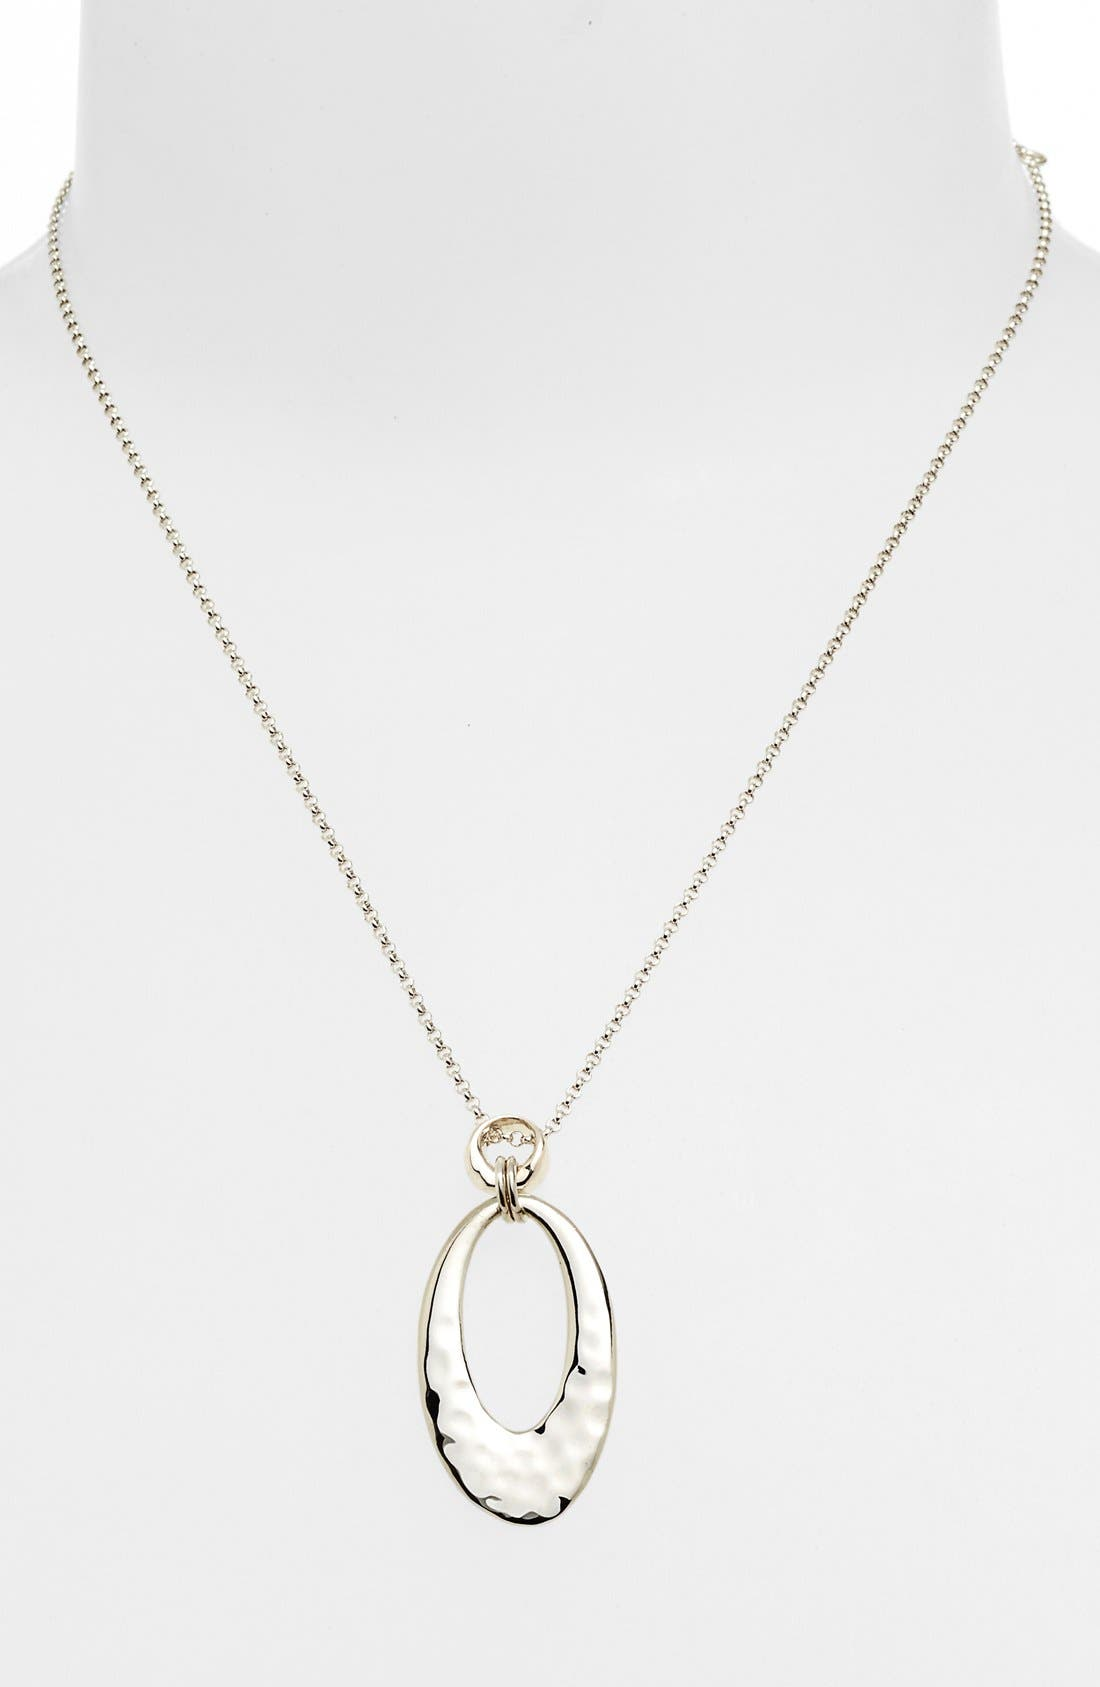 Main Image - Judith Jack 'Oahu' Hammered Oval Pendant Necklace